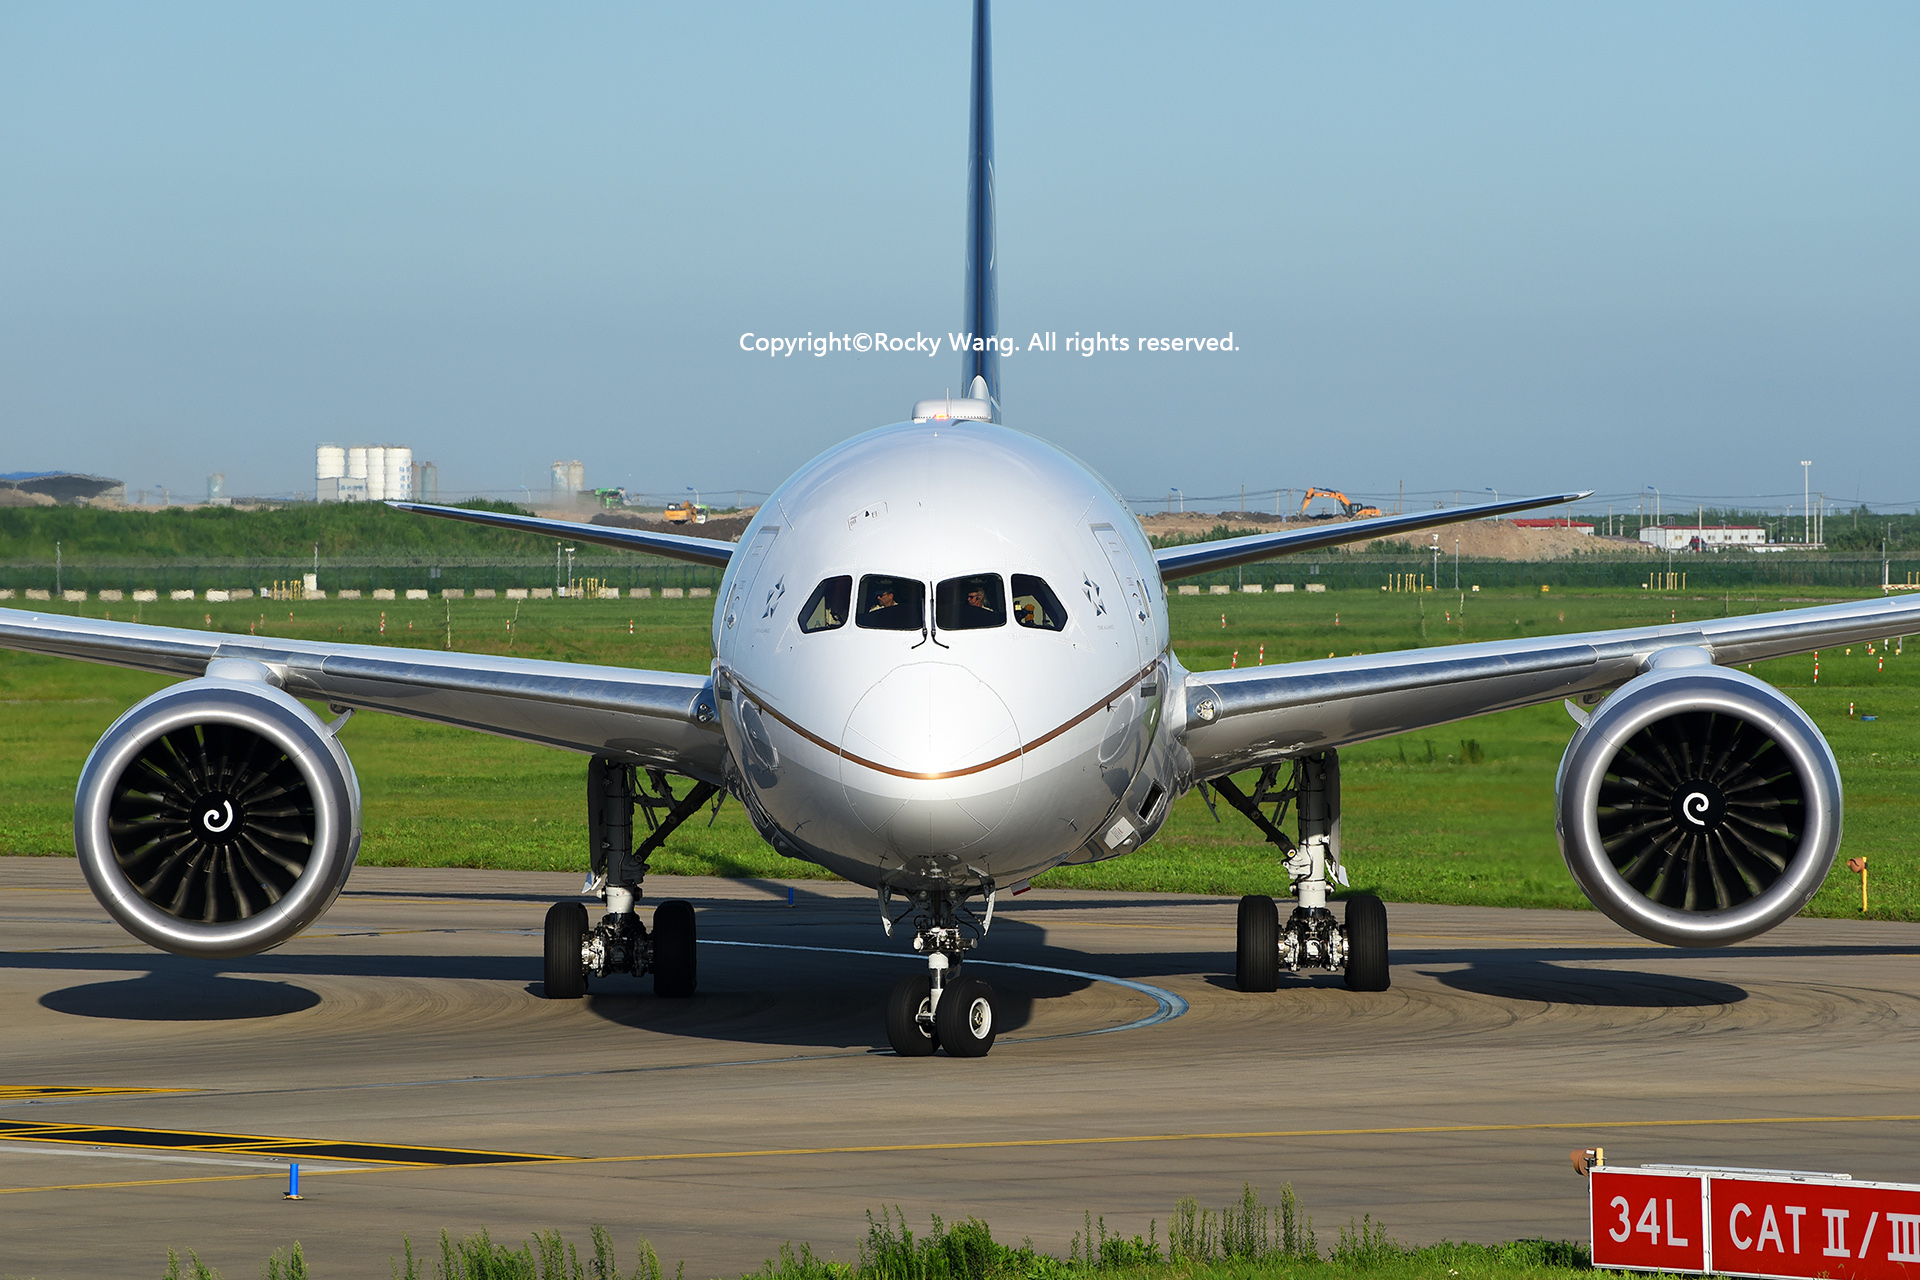 Re:[原创]盗图就别狂 发组表情自己体会 BOEING 787-9 DREAMLINER N29971 Shanghai Pudong